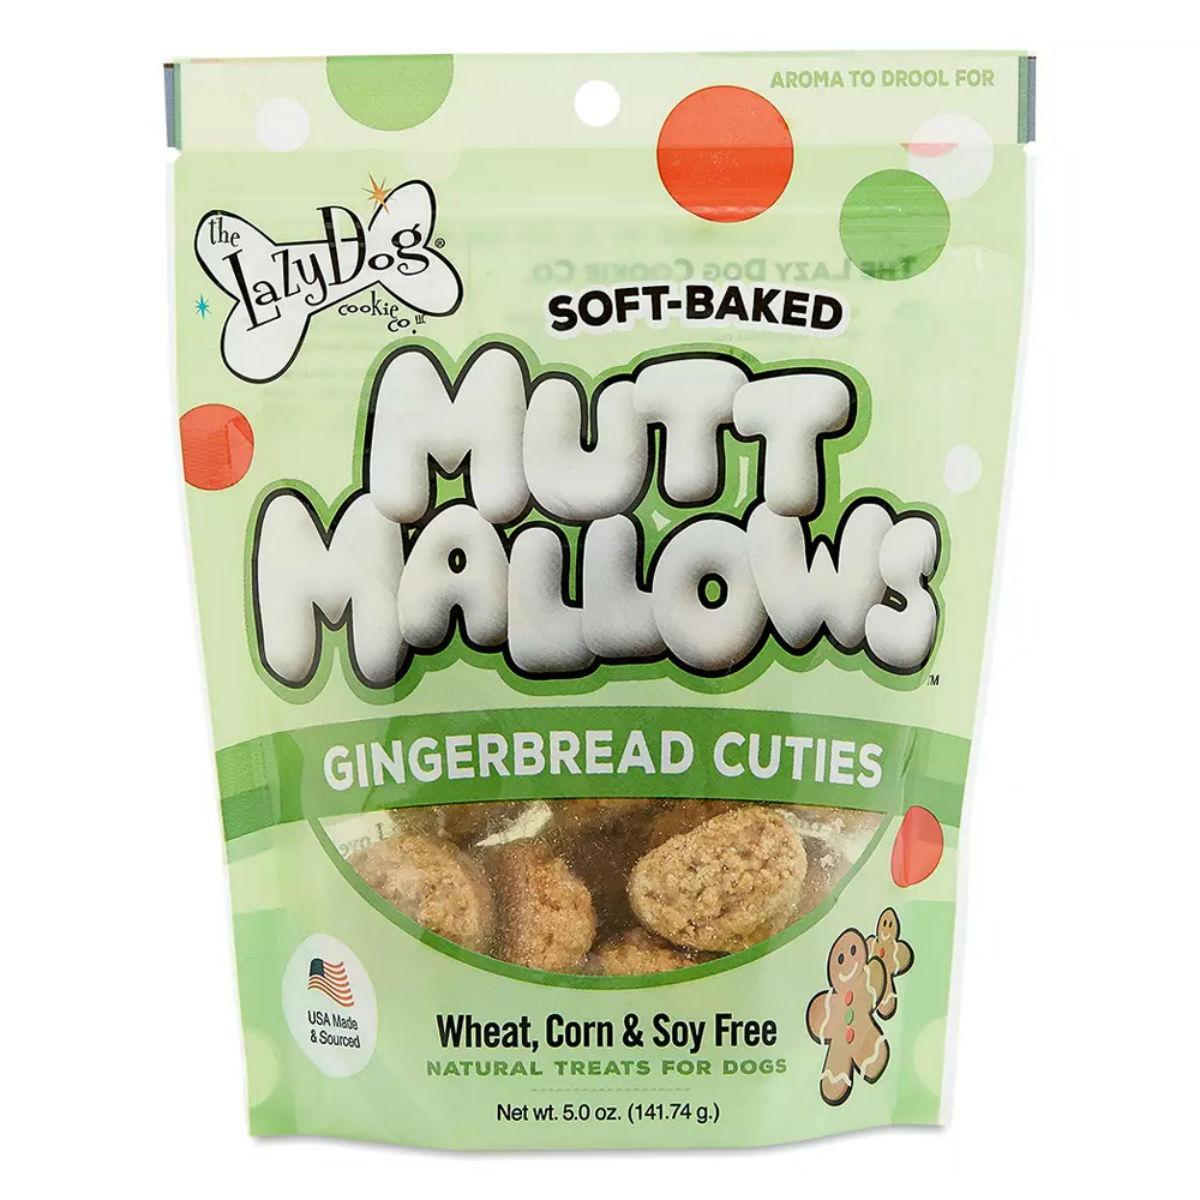 Lazy Dog Mutt Mallows Soft-Baked Dog Treats - Gingerbread Cuties